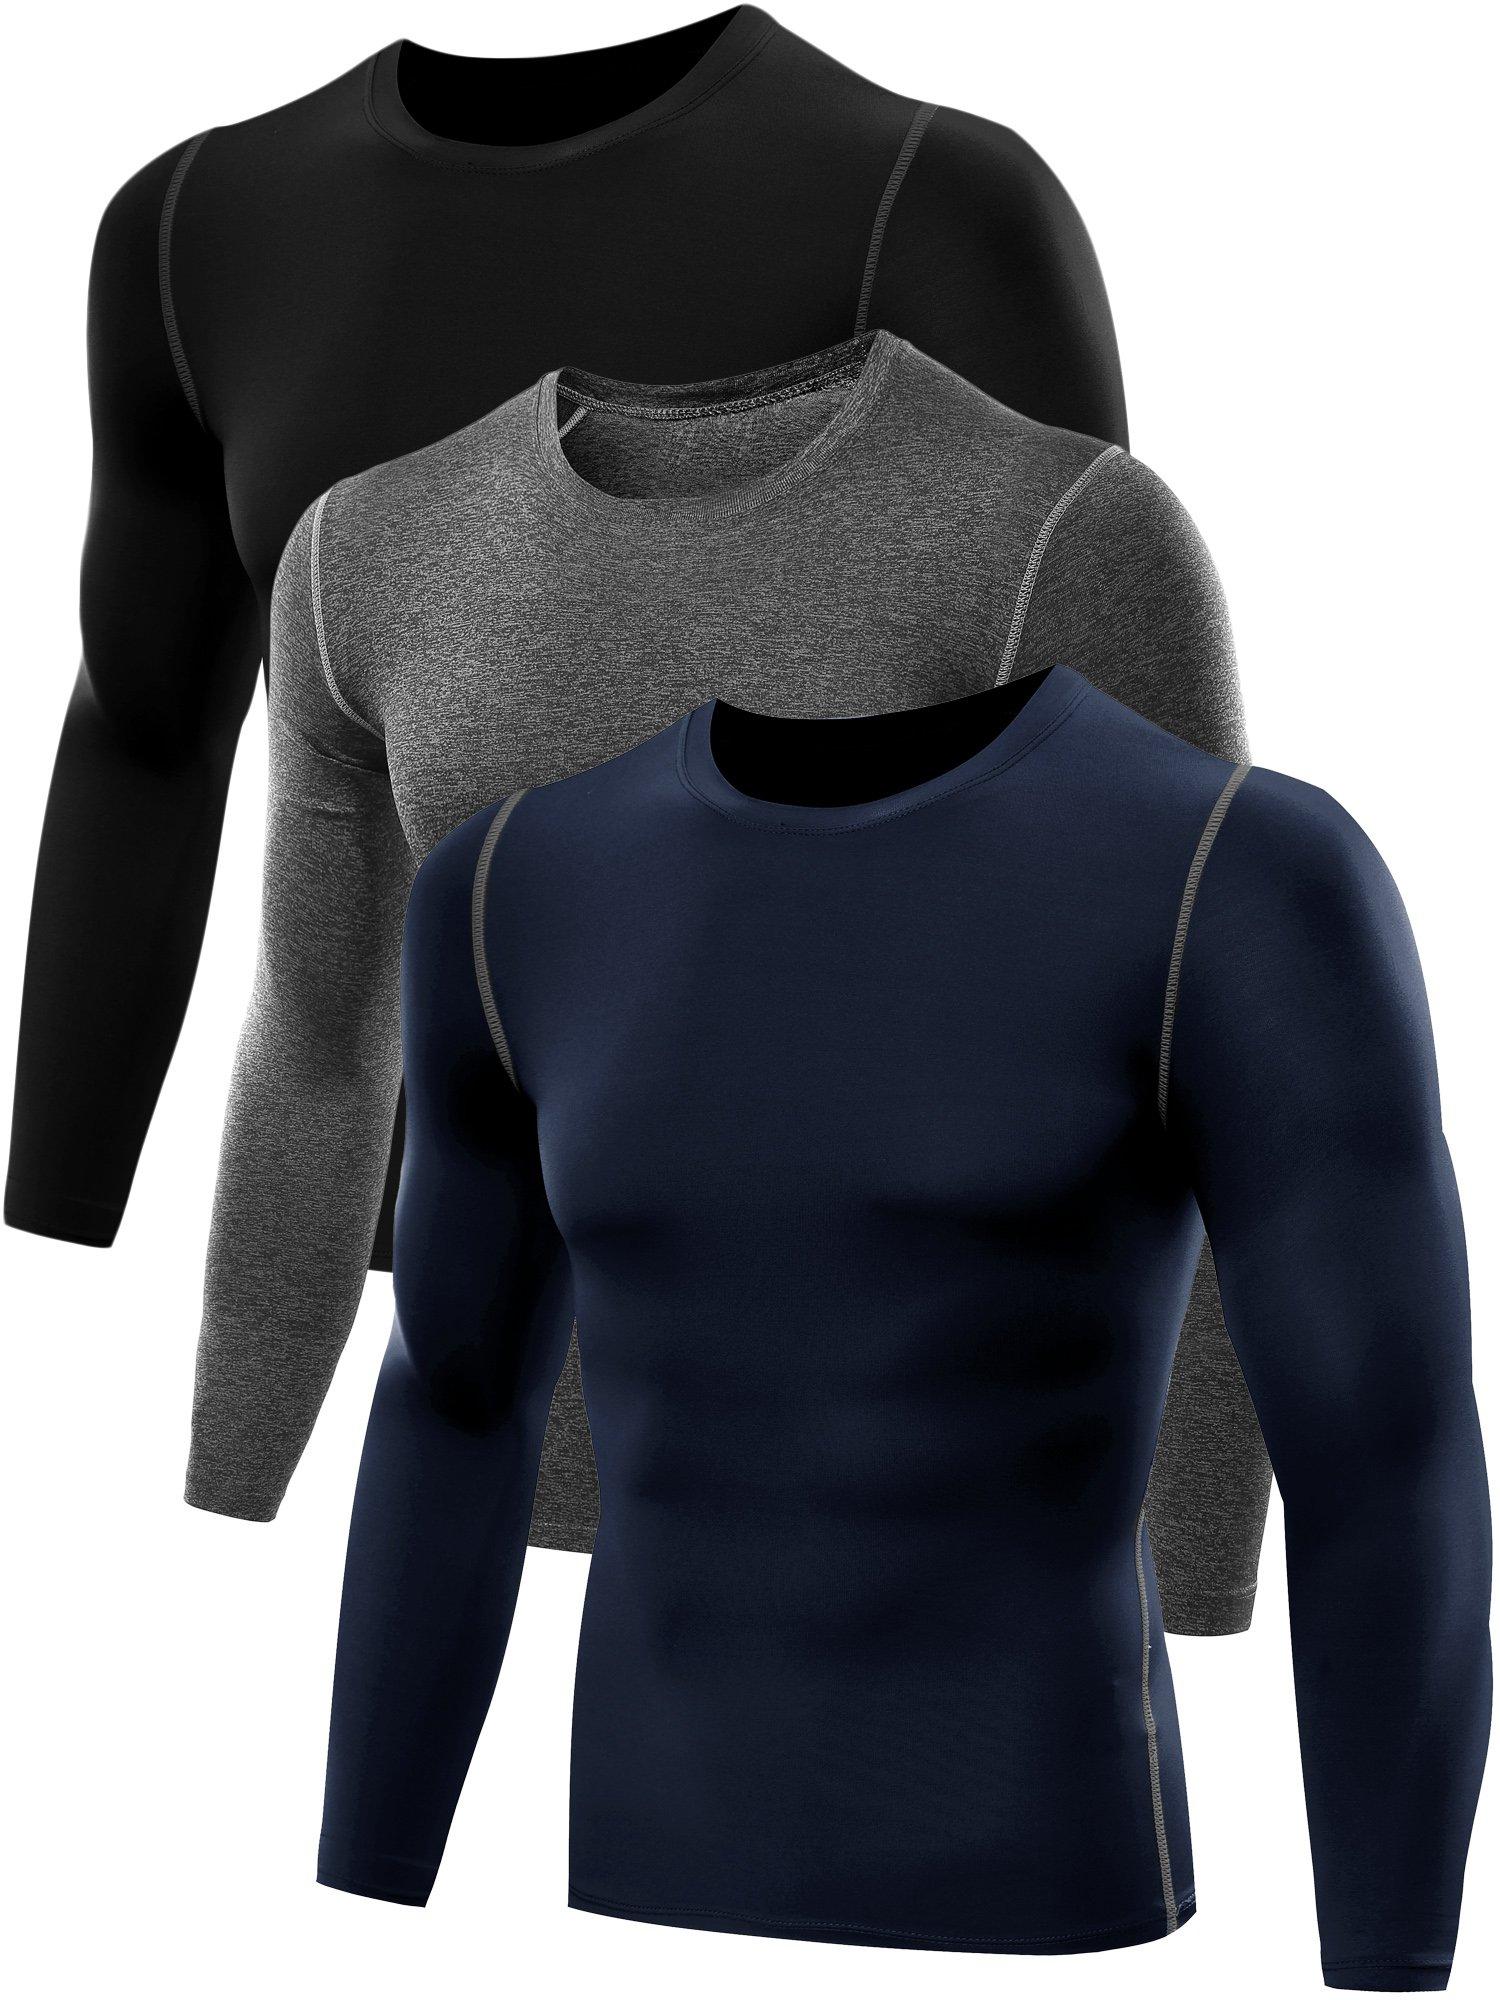 Neleus Men's 3 Pack Athletic Compression Long Sleeve Shirt,008,Black,Grey,Navy Blue,US S,EU M